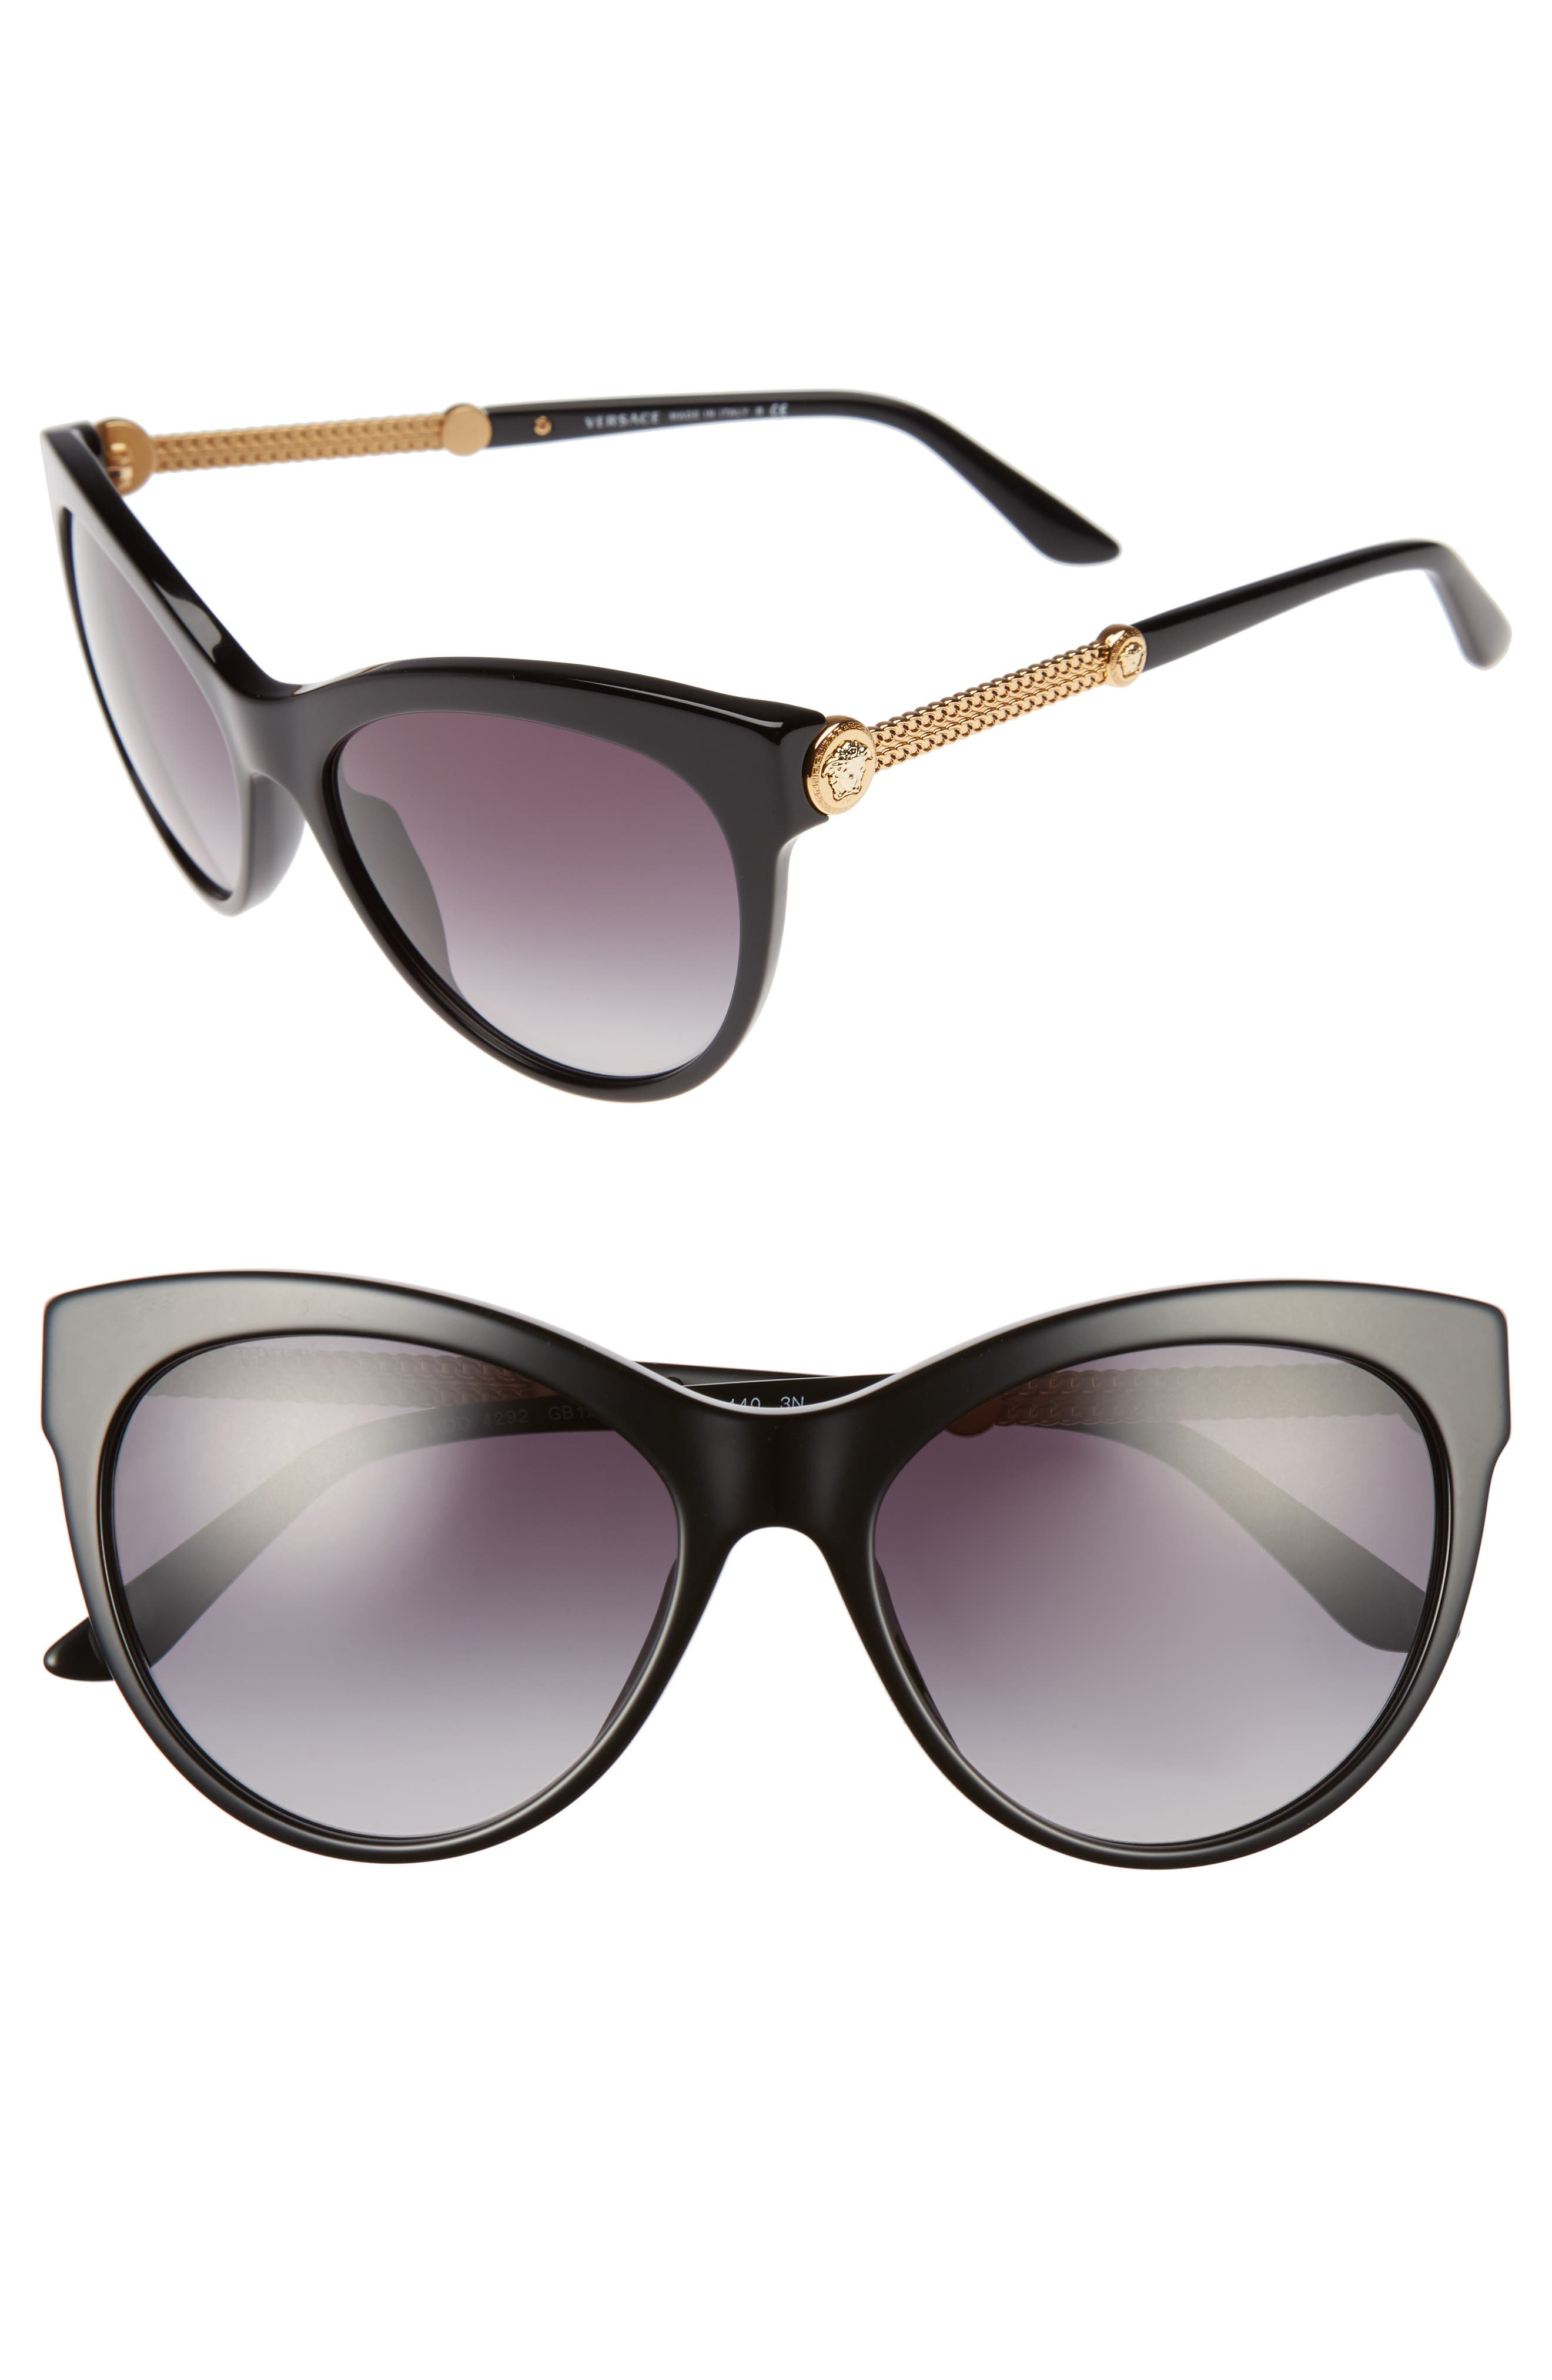 57mm Cat Eye Sunglasses,                             Main thumbnail 1, color,                             001